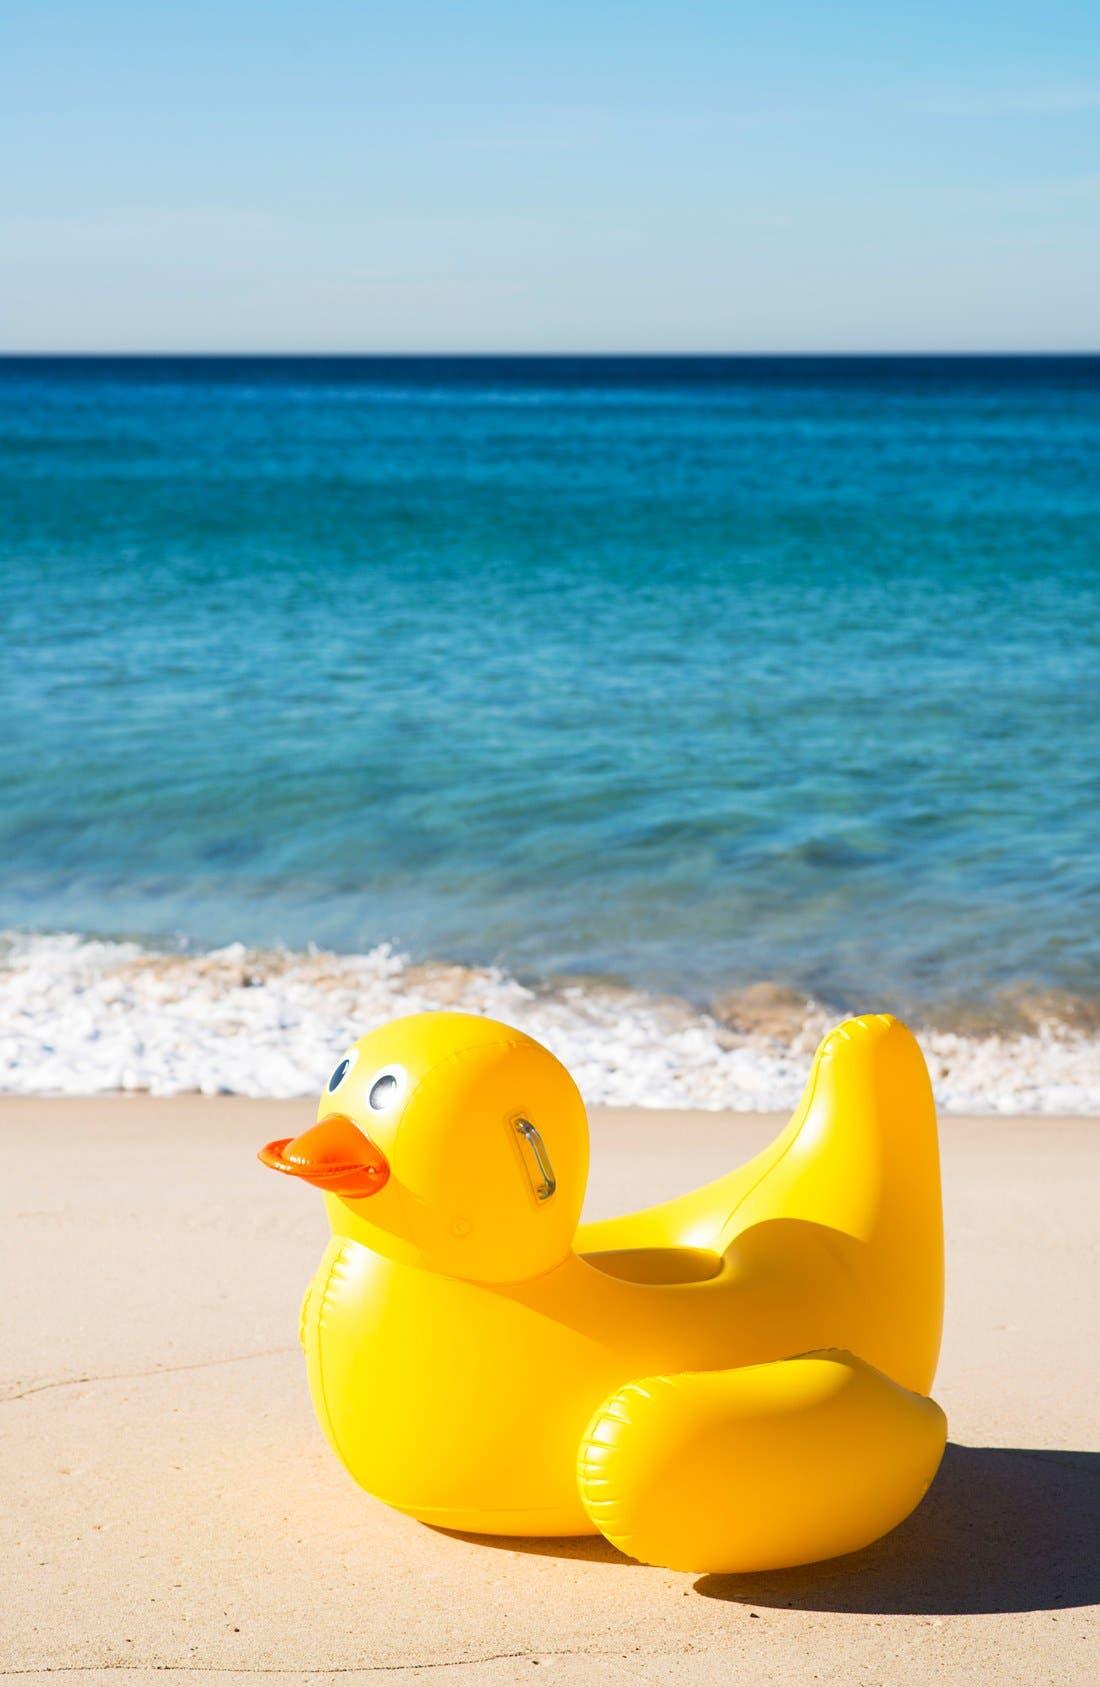 Alternate Image 3  - Sunnylife 'Really Big' Inflatable Duck Pool Floatie